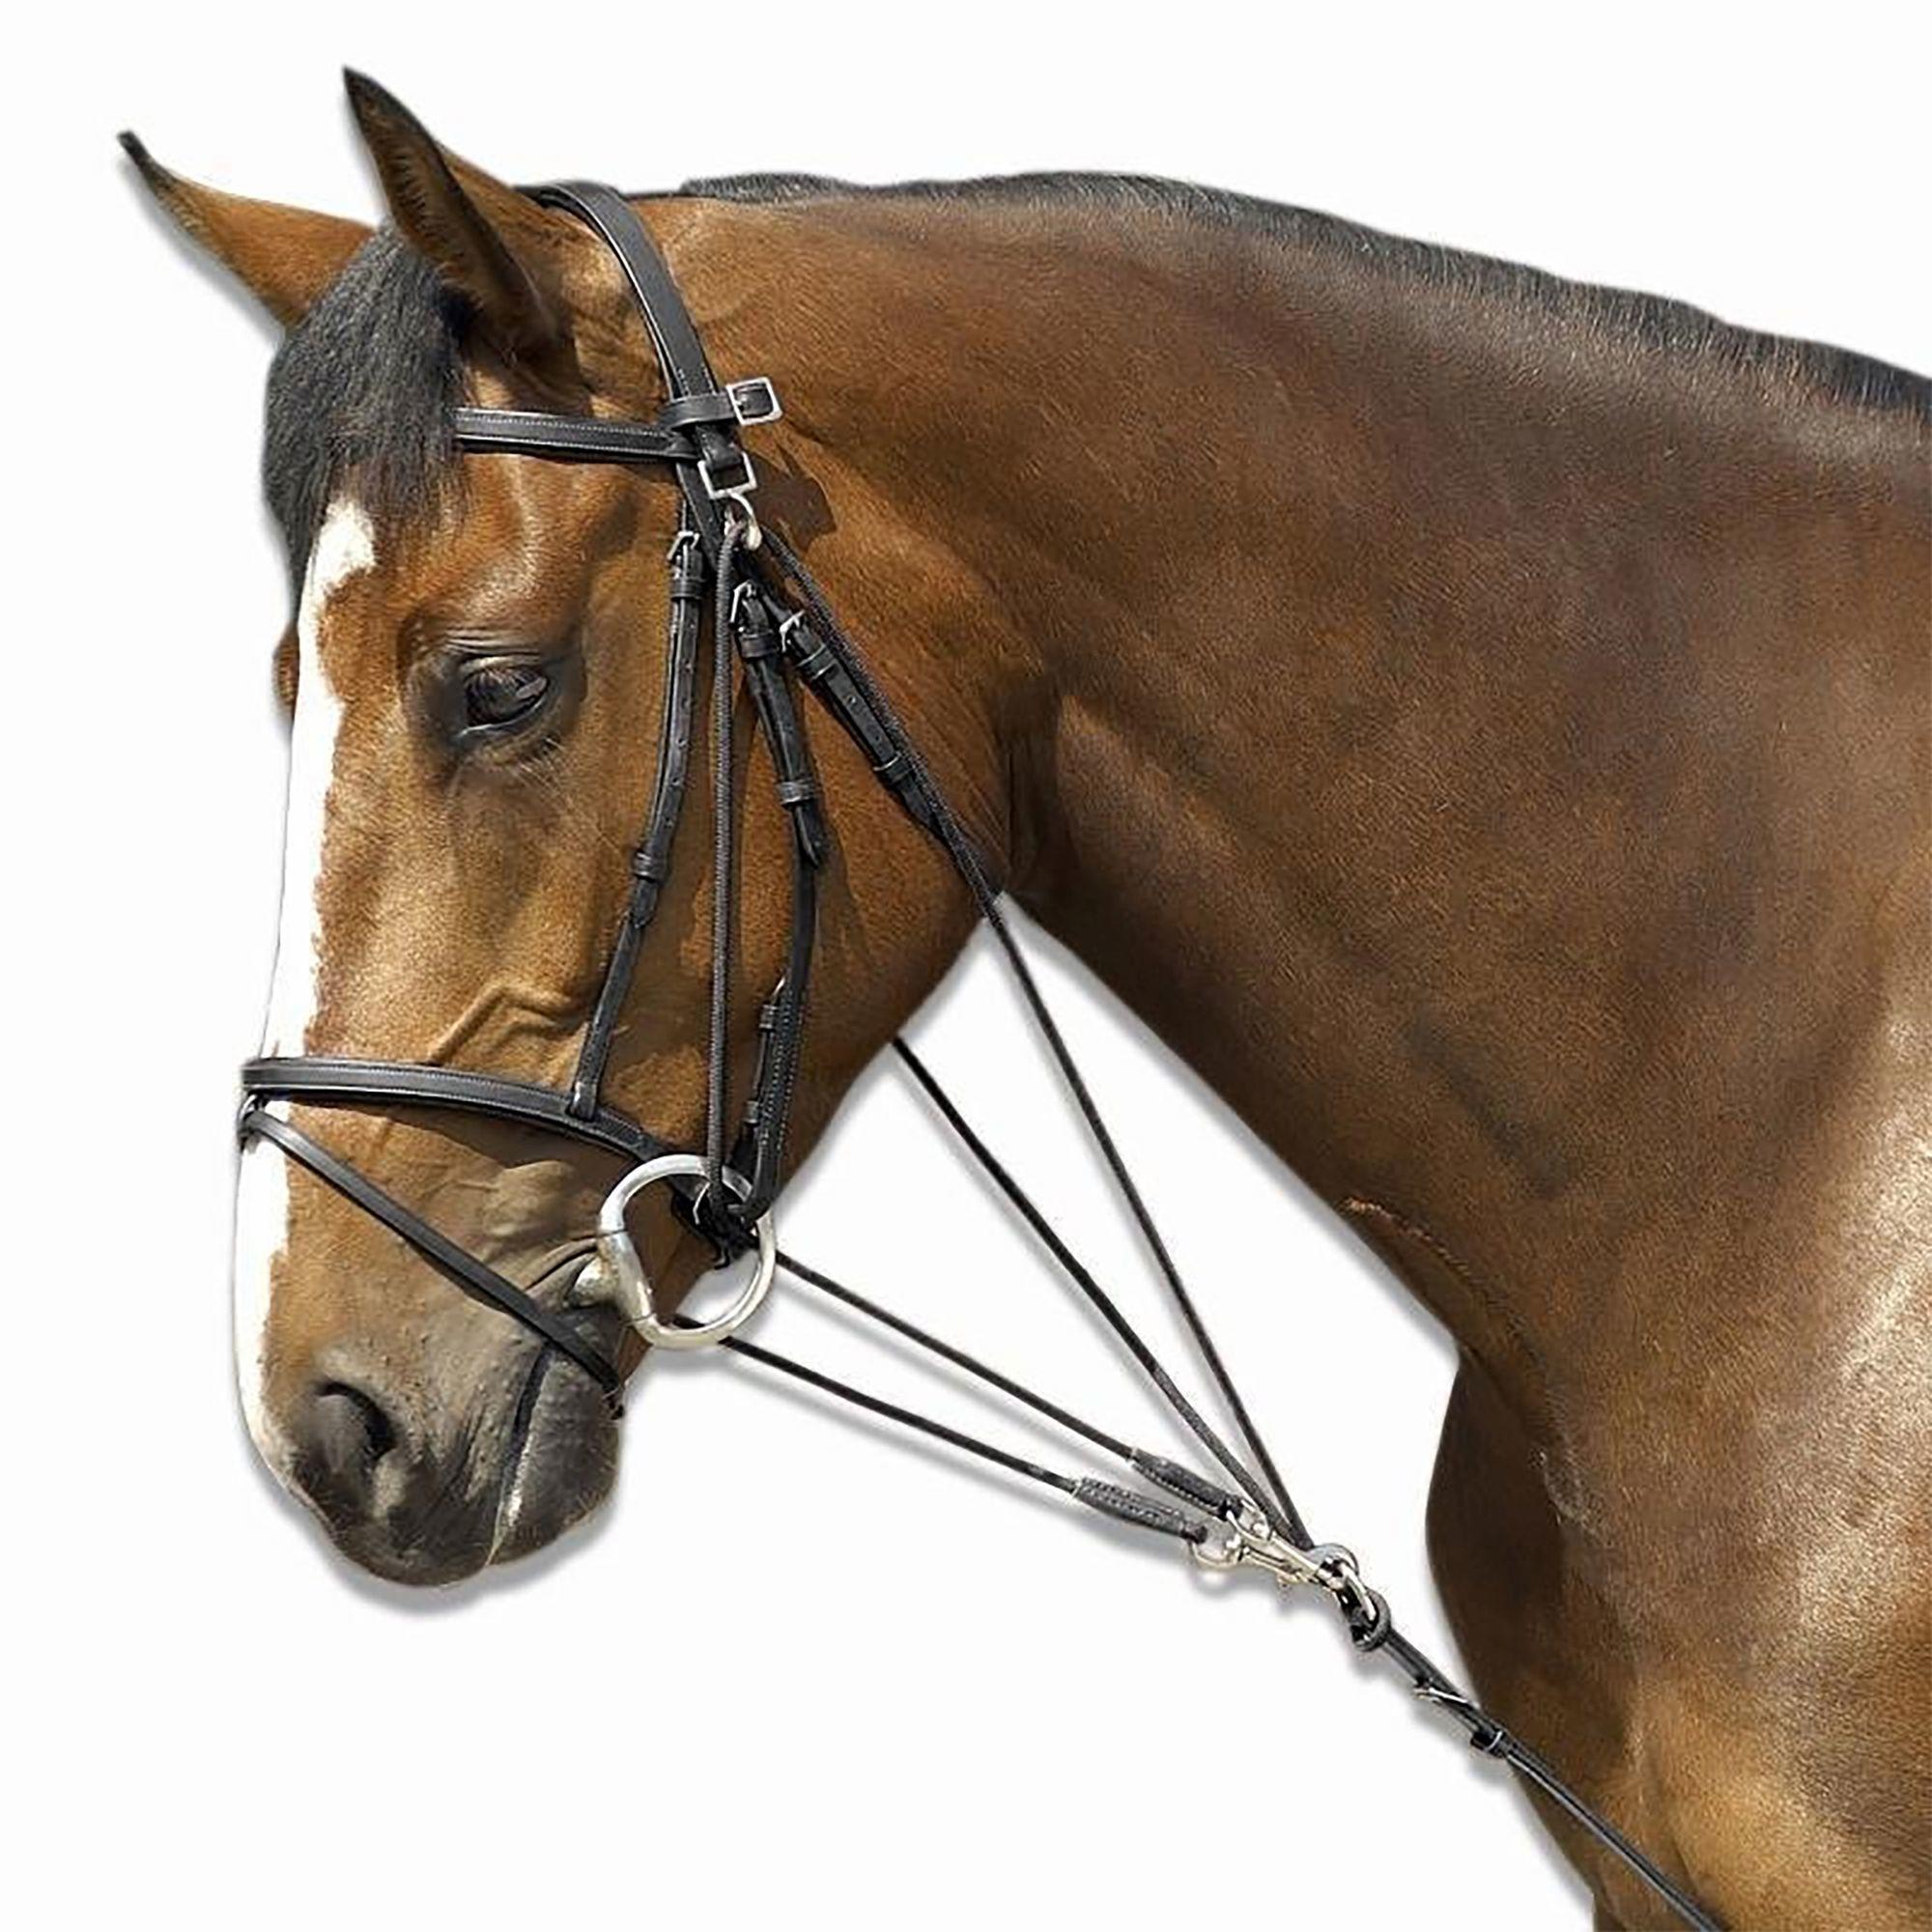 Schooling Horseback Riding de Gogue for Horse - Black